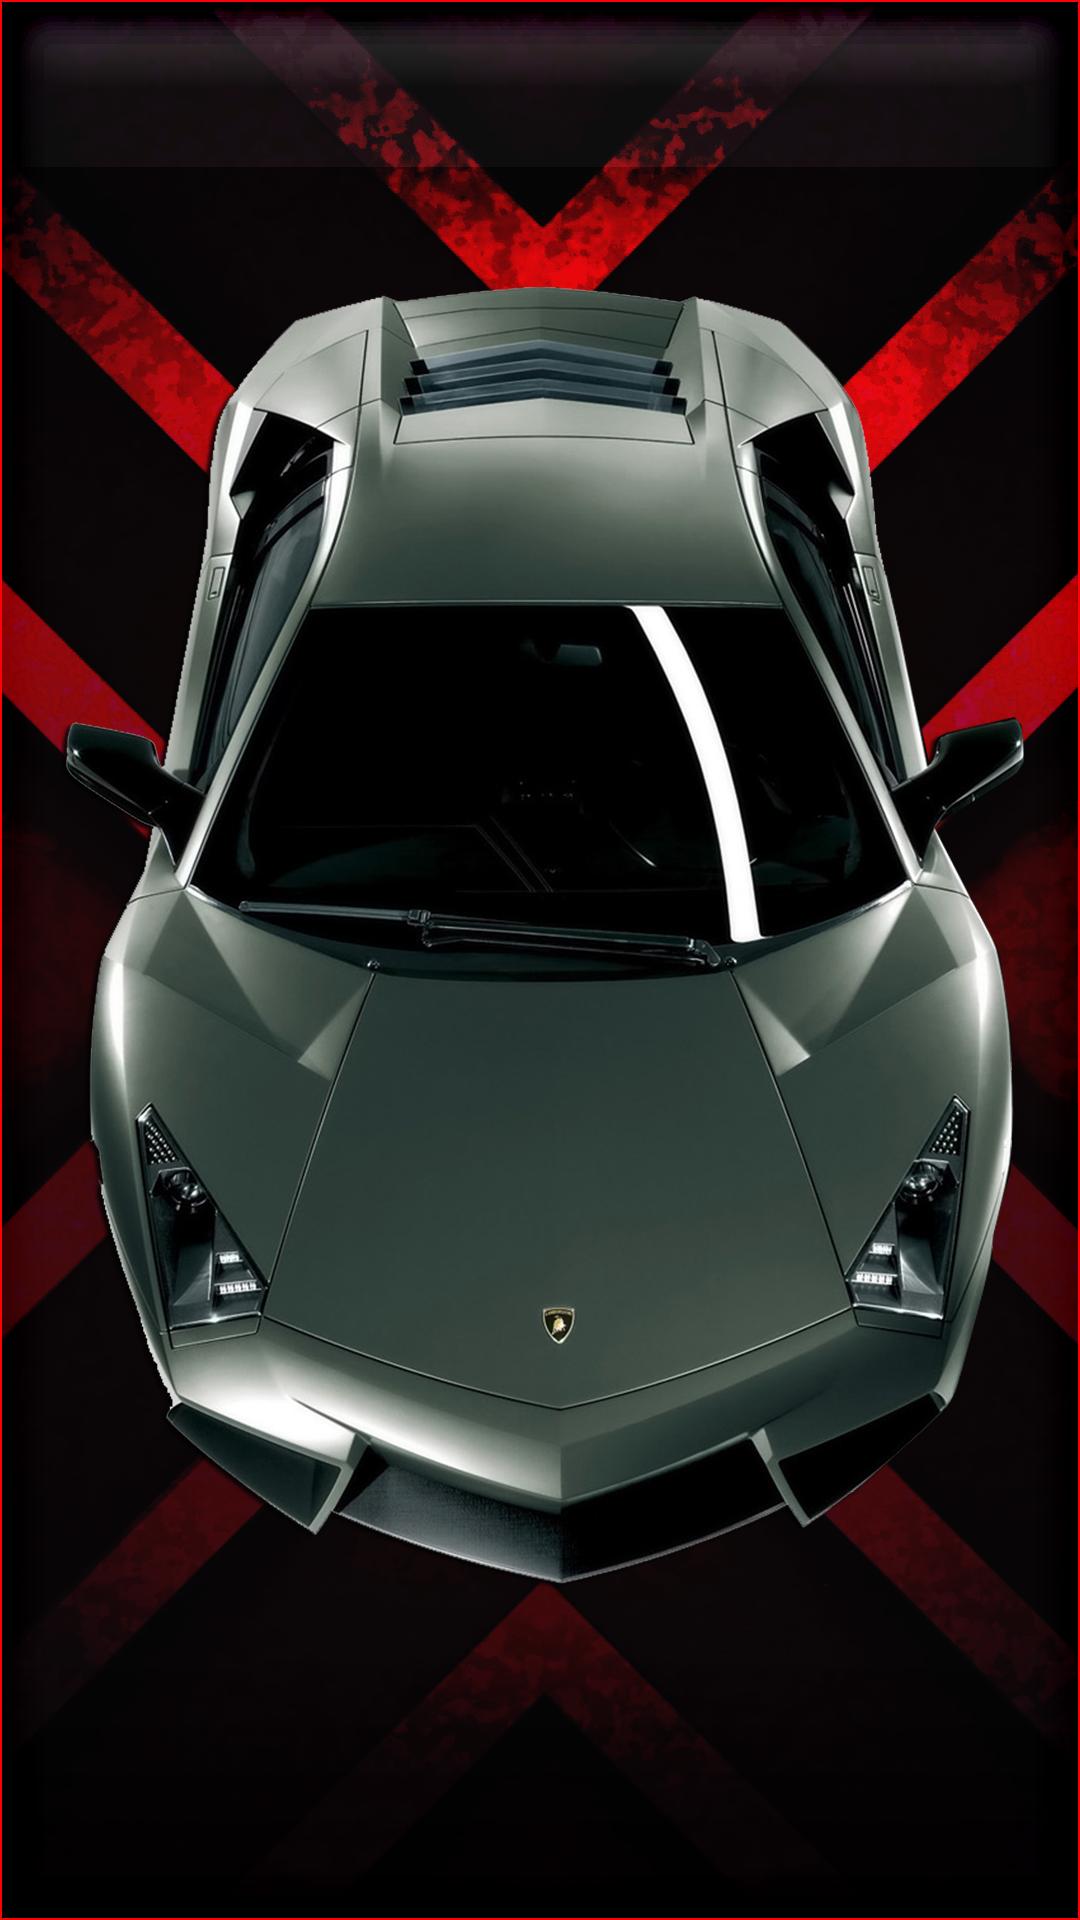 Download Our Hd Lamborghini Car Wallpaper For Android - Lamborghini Reventon Top View , HD Wallpaper & Backgrounds